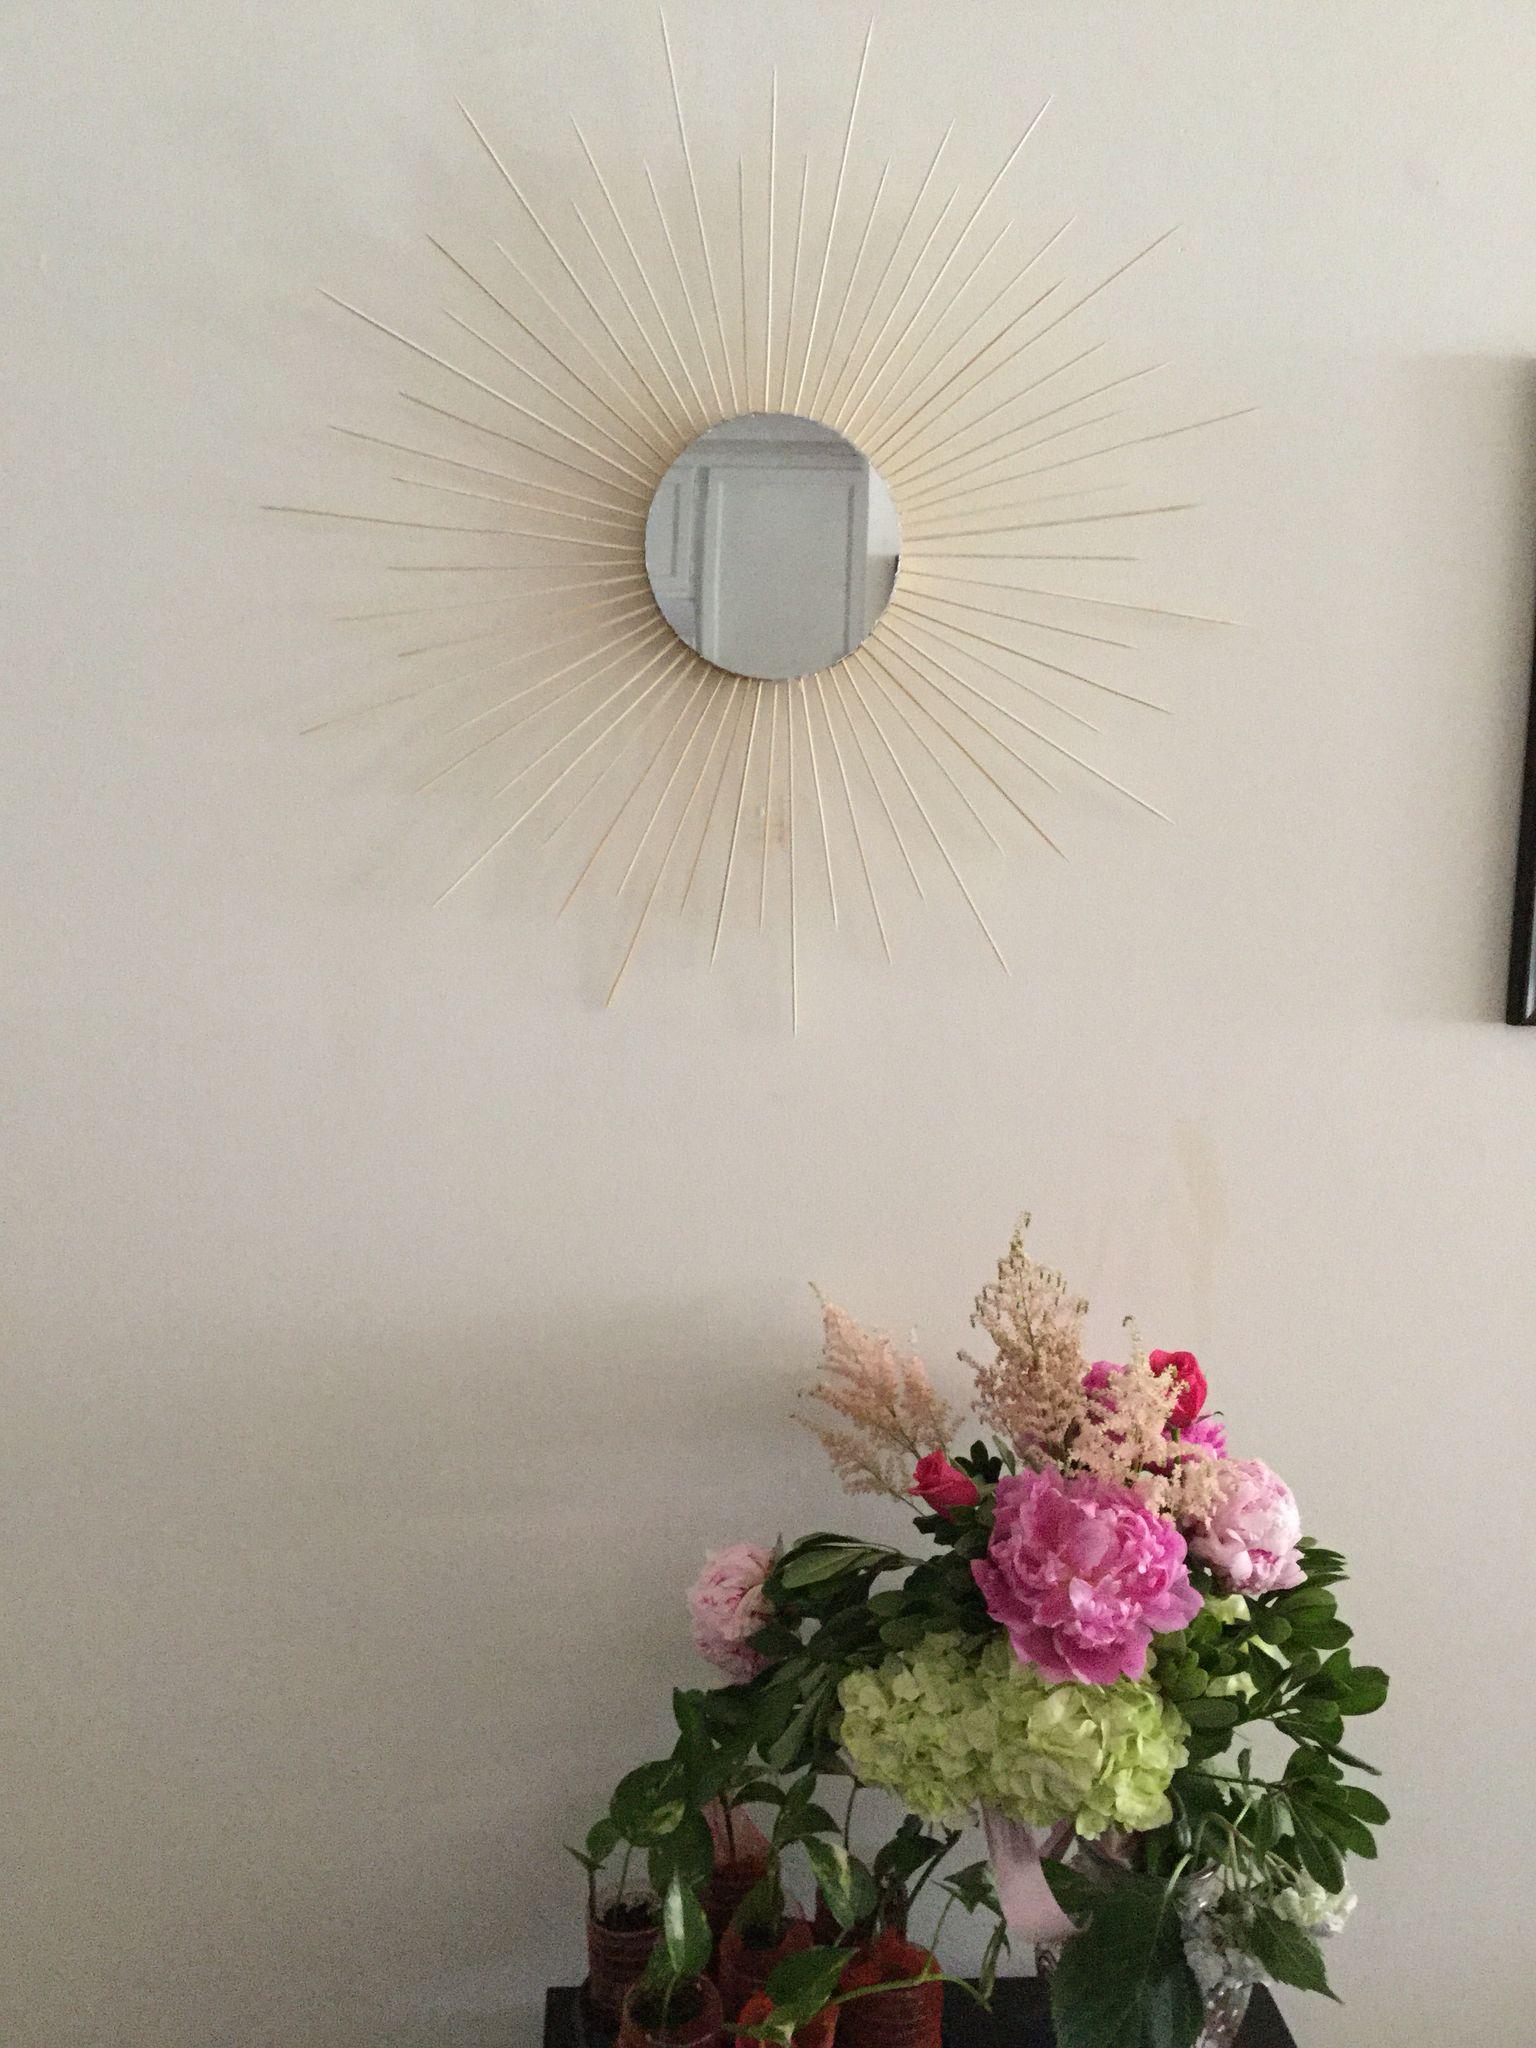 #diy #decor #sunburst #mirror #bamboo sticks  #cardboard #glue